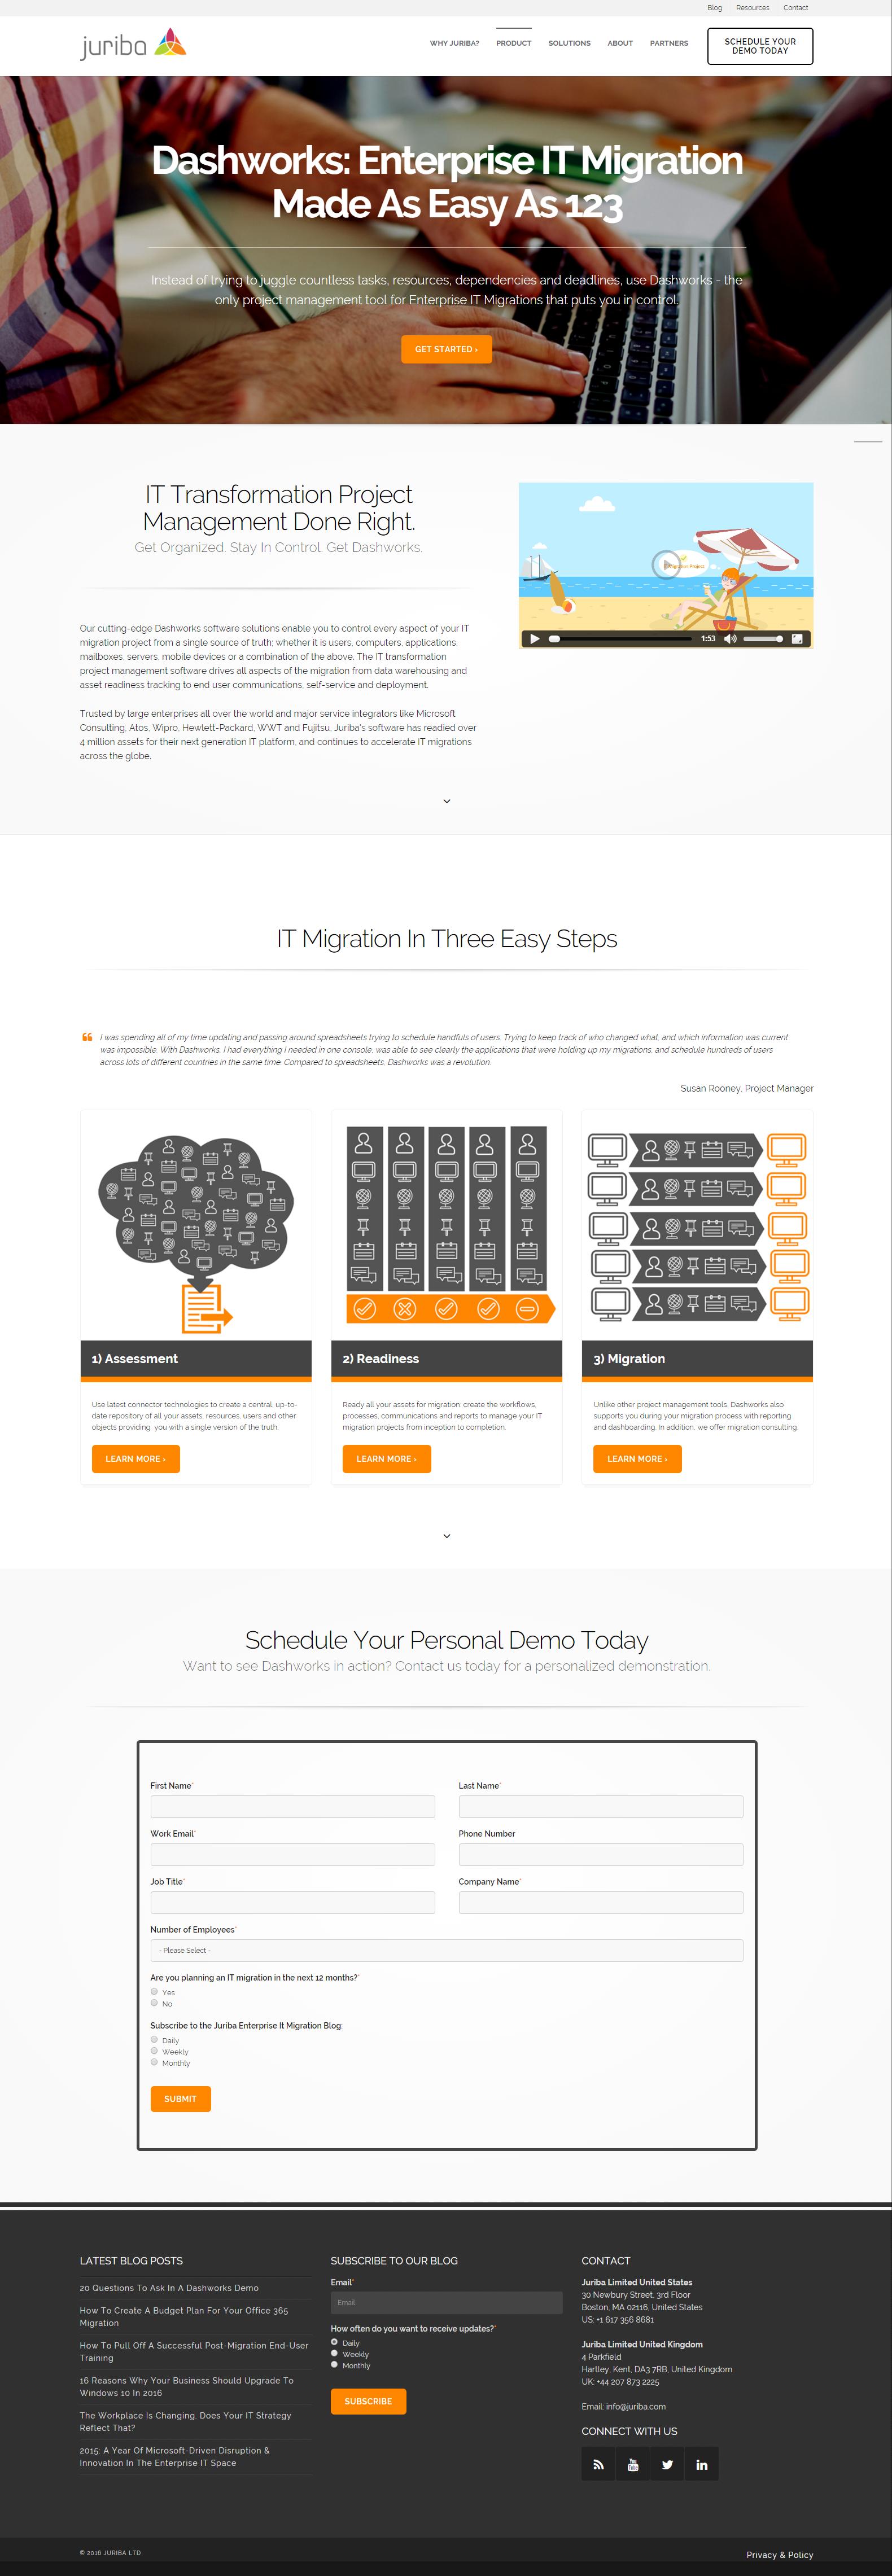 Dashworks___IT_Migration_Project_Management.png